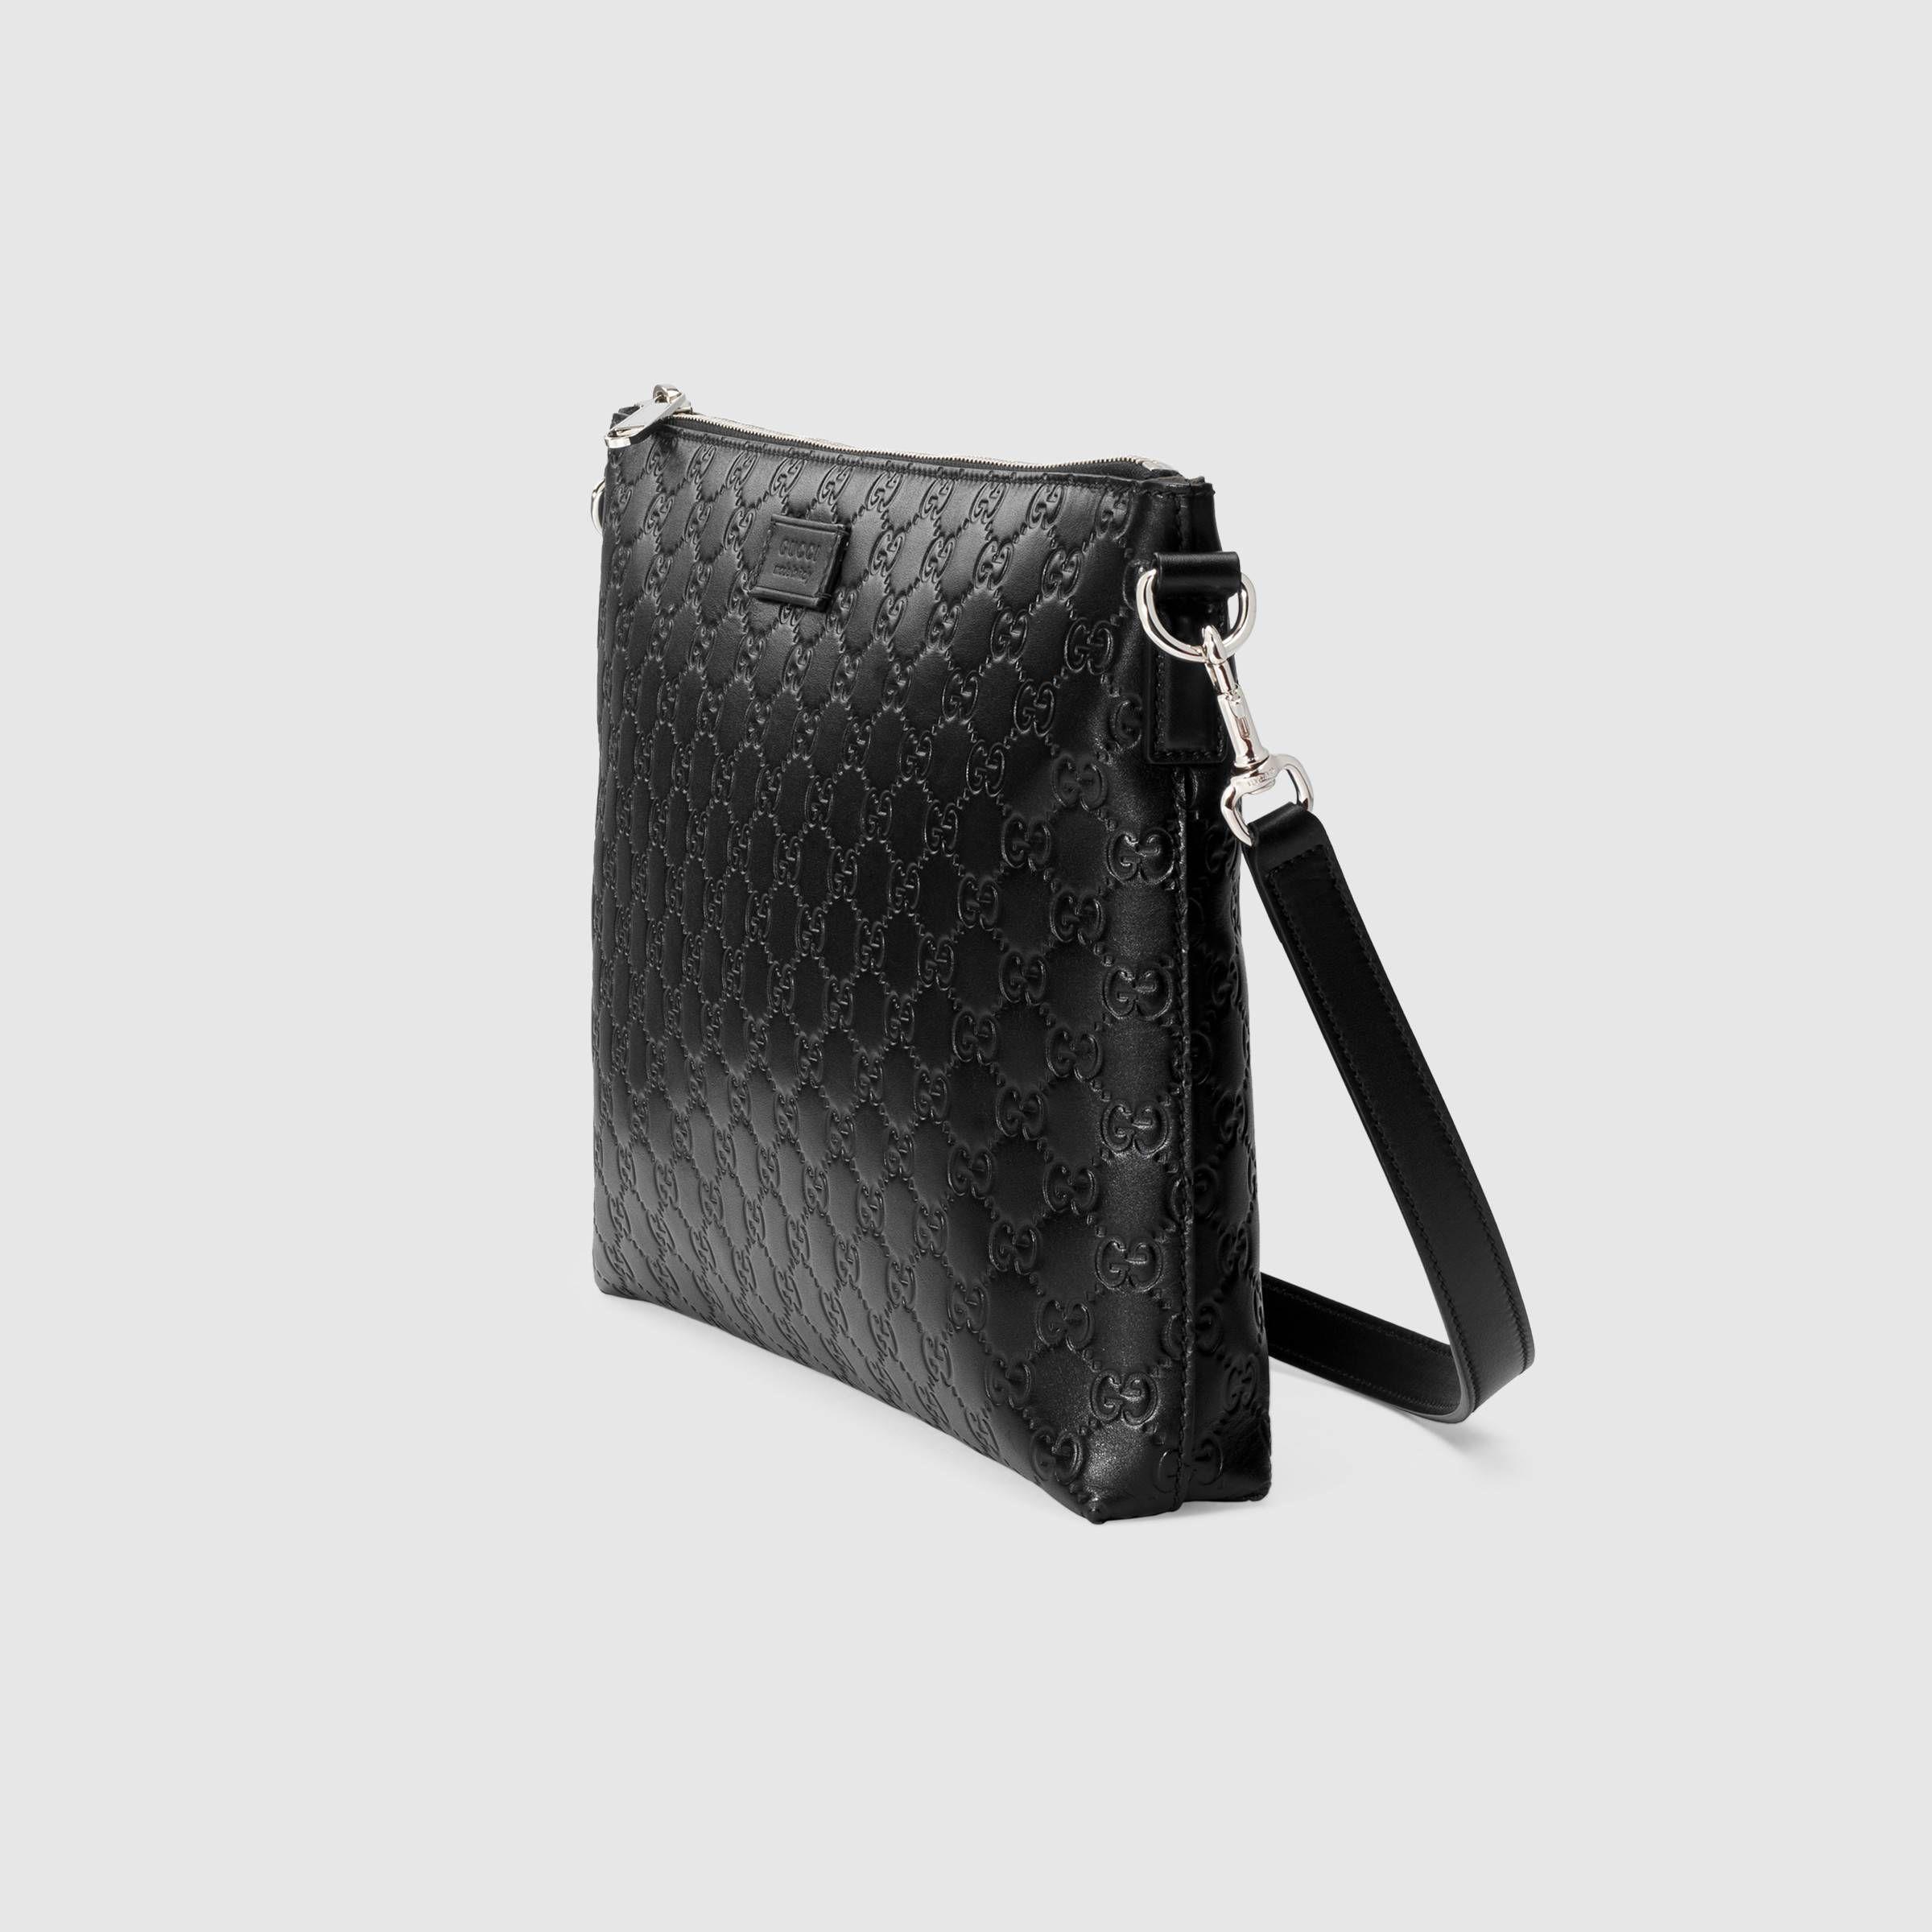 89872e6c92a6 Gucci Signature soft messenger in Black Gucci Signature soft leather with black  leather trims | Gucci Men's Messenger Bags